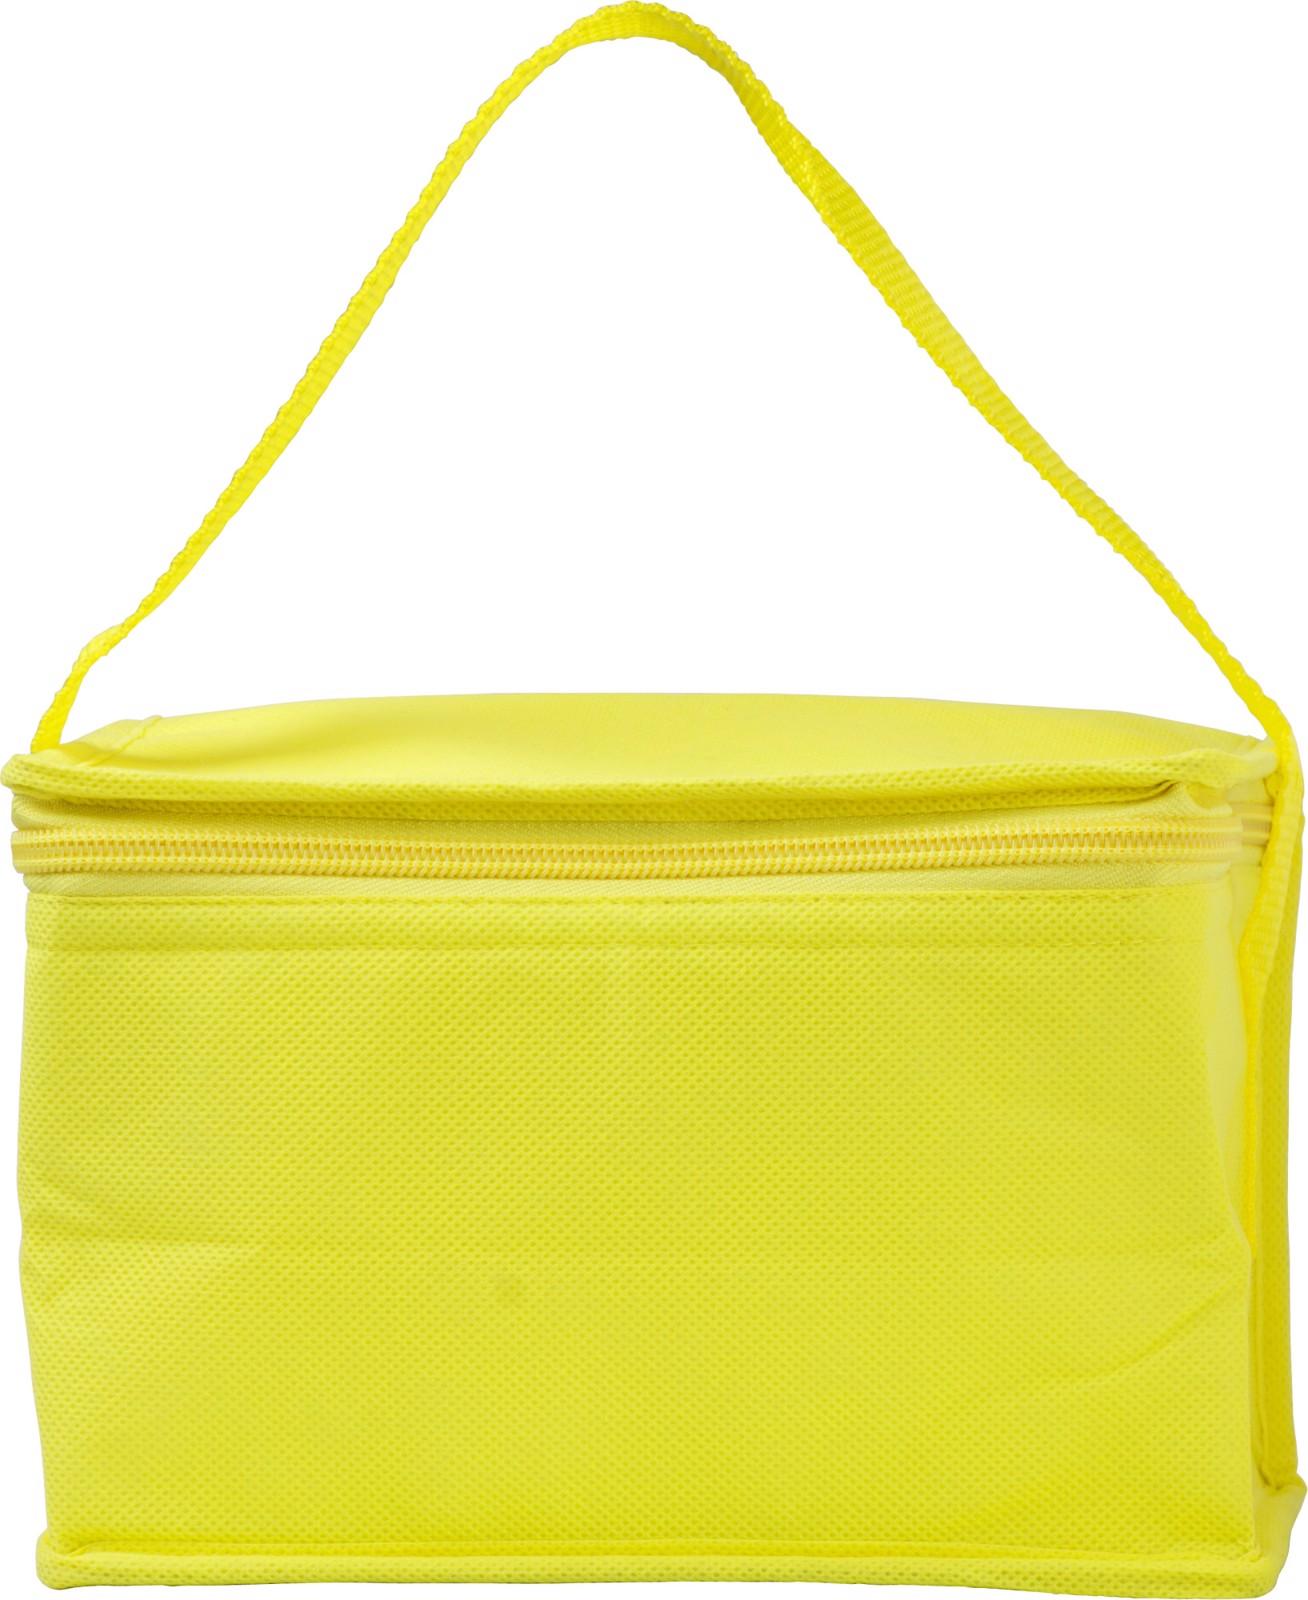 Nonwoven (80 gr/m²) cooler bag - Yellow